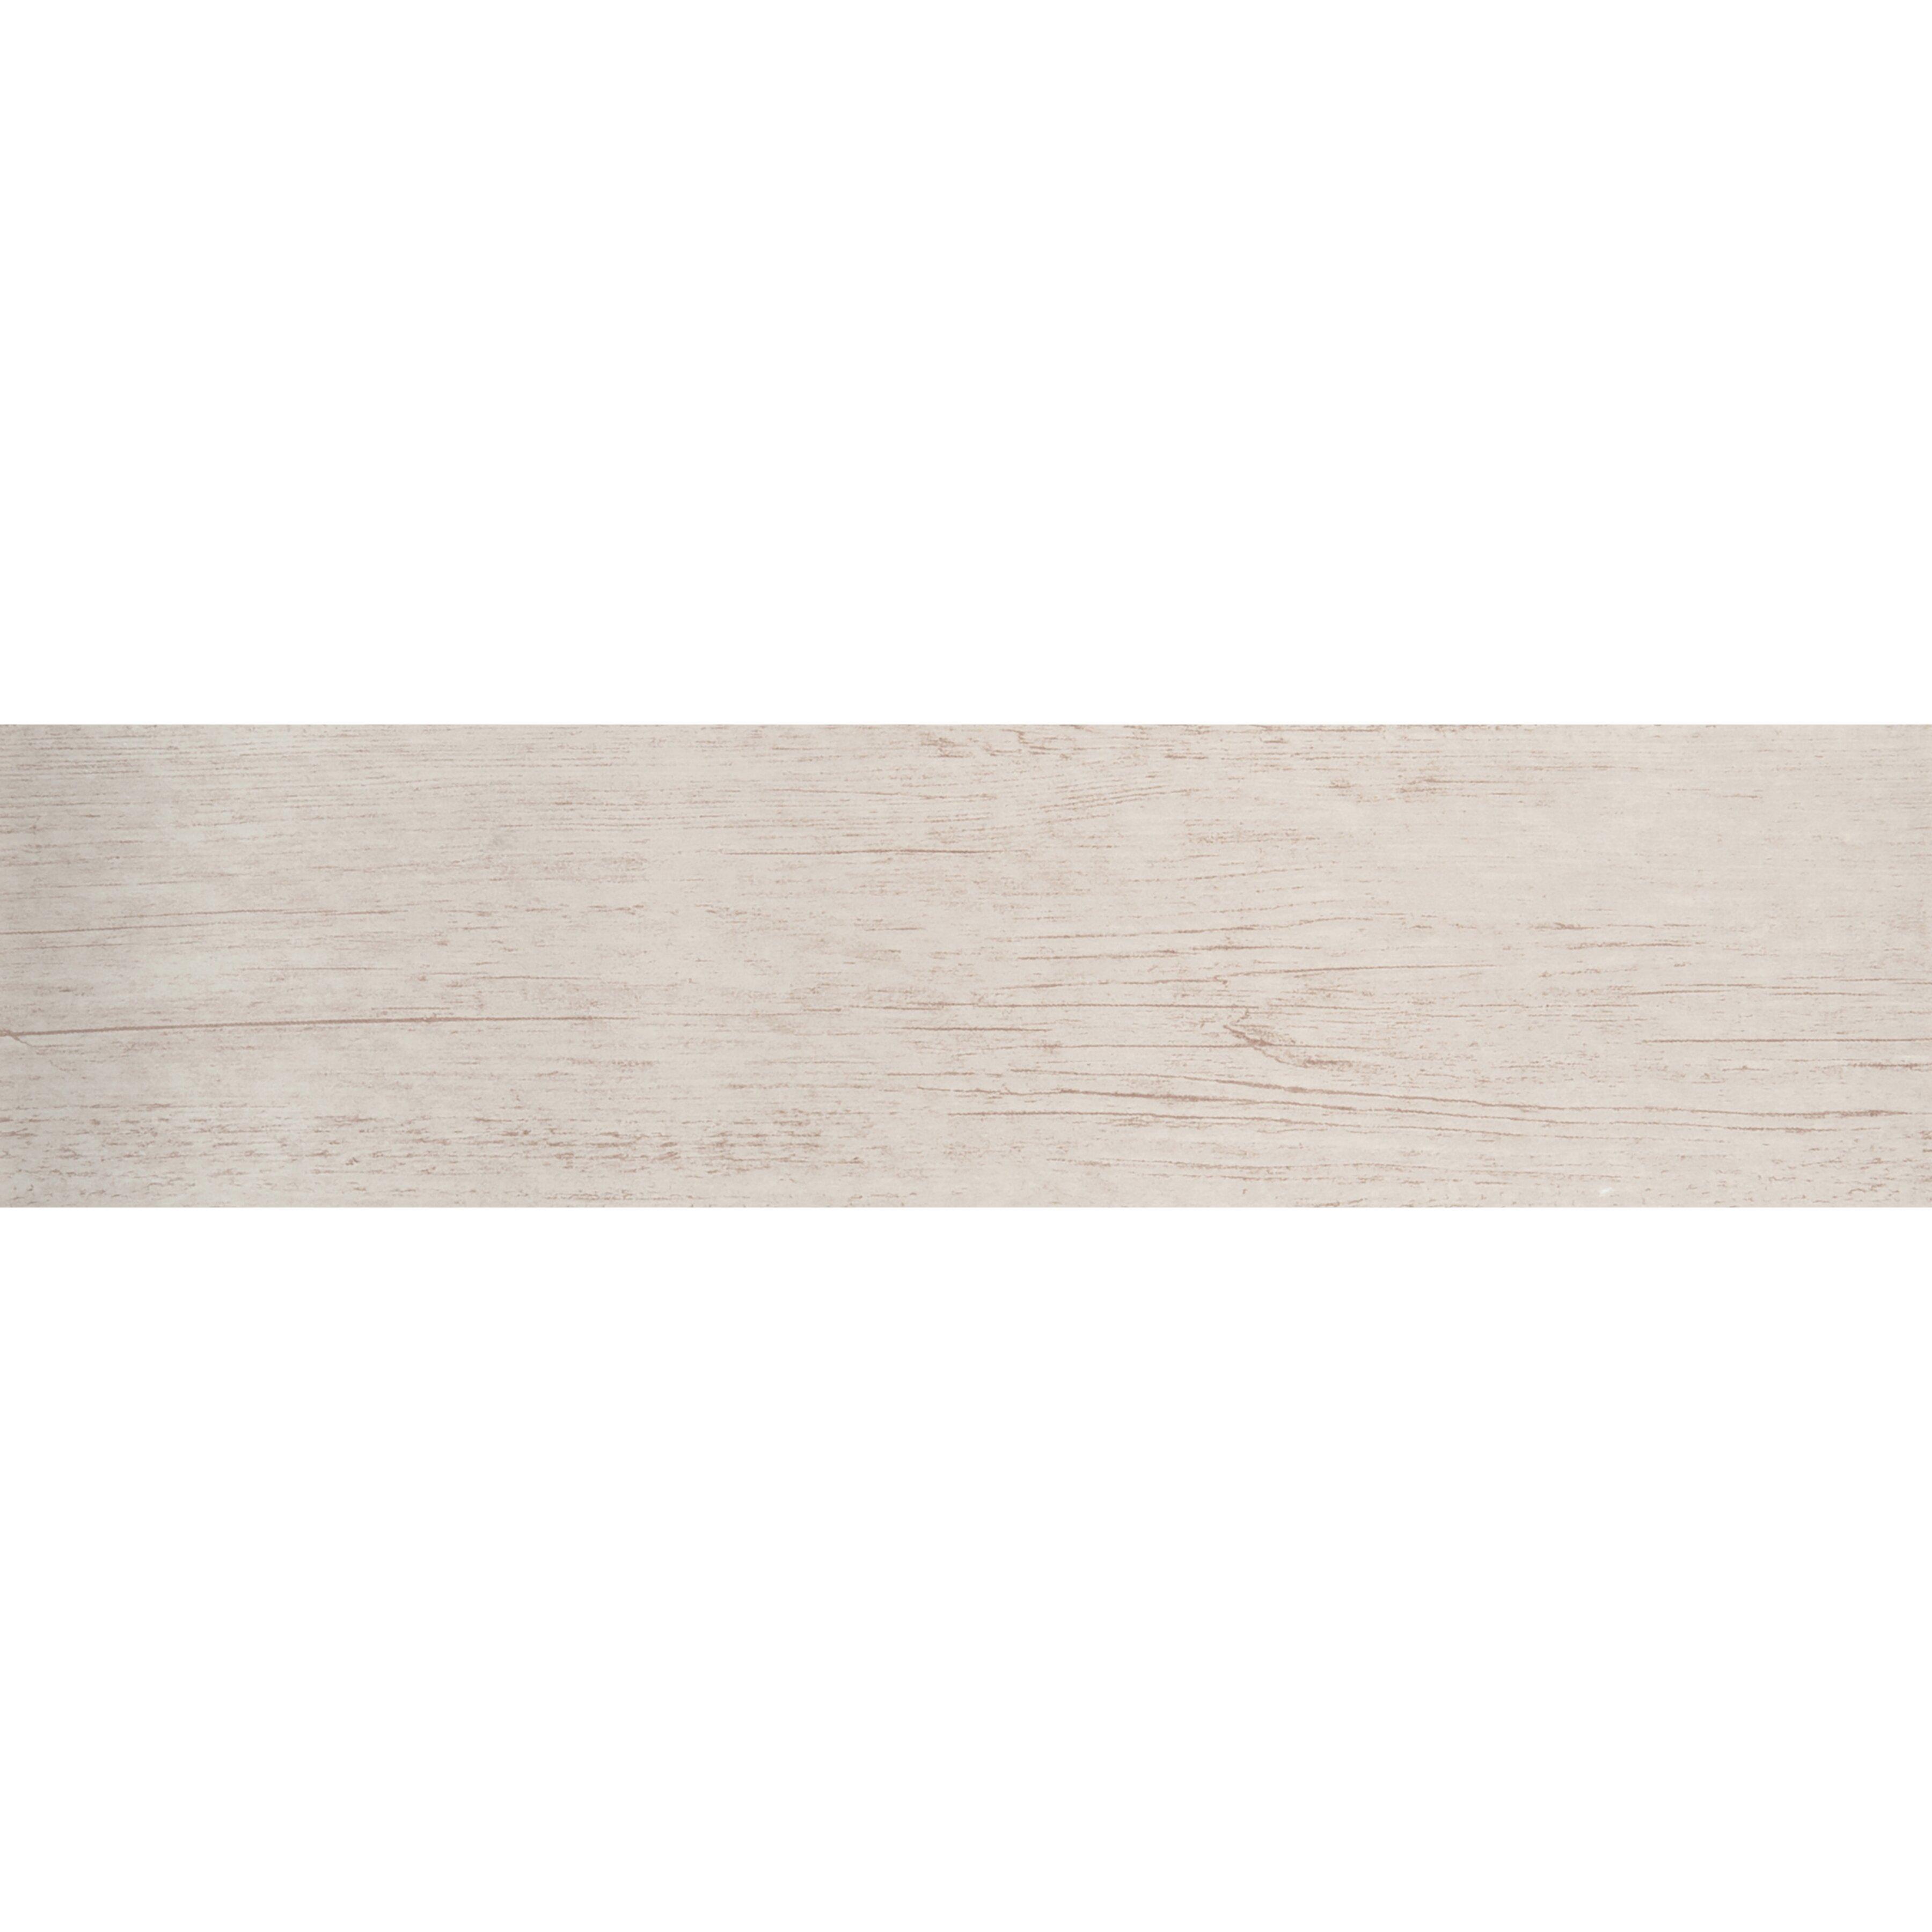 "Emser Tile Country 6"" x 24"" Porcelain Wood Look Tile in"